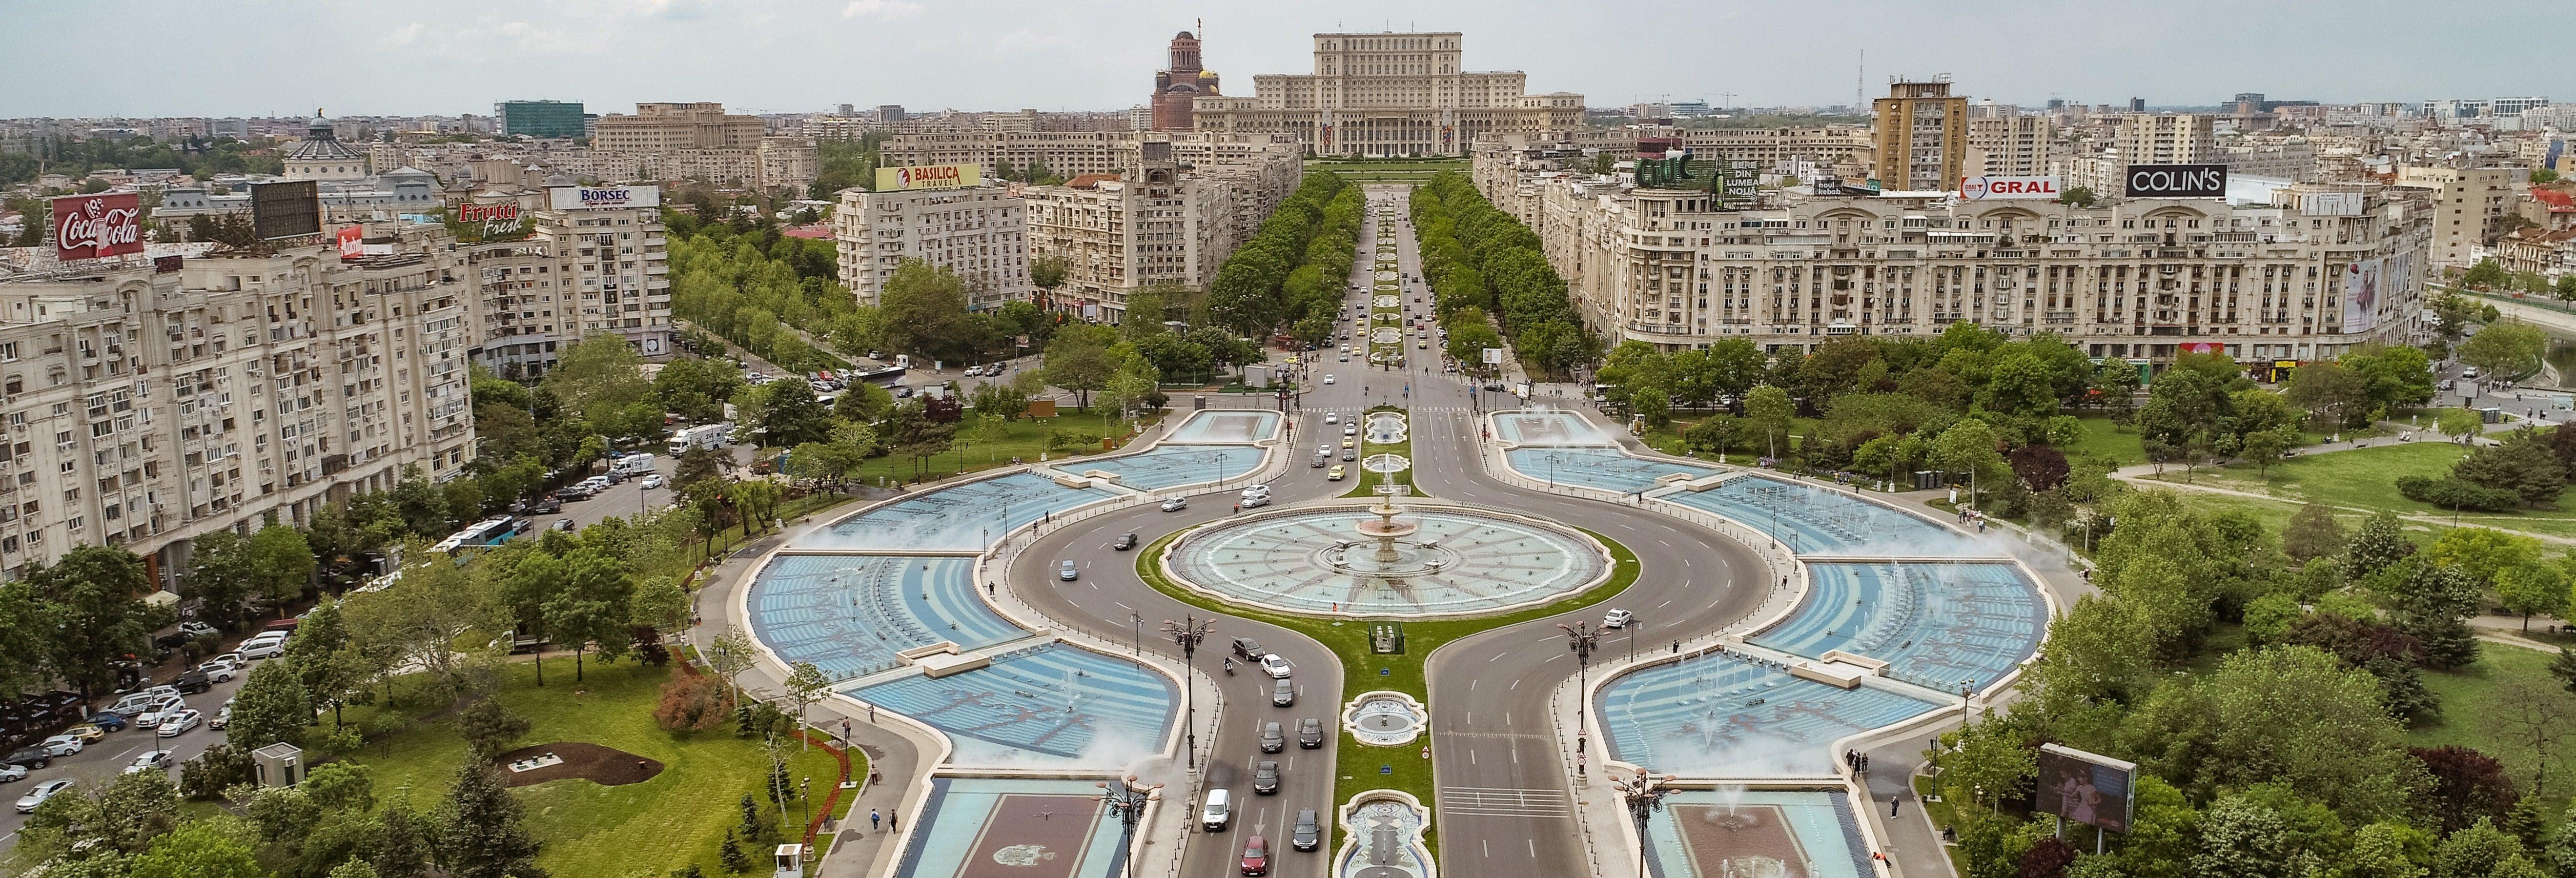 Free Walking Tour of Bucharest